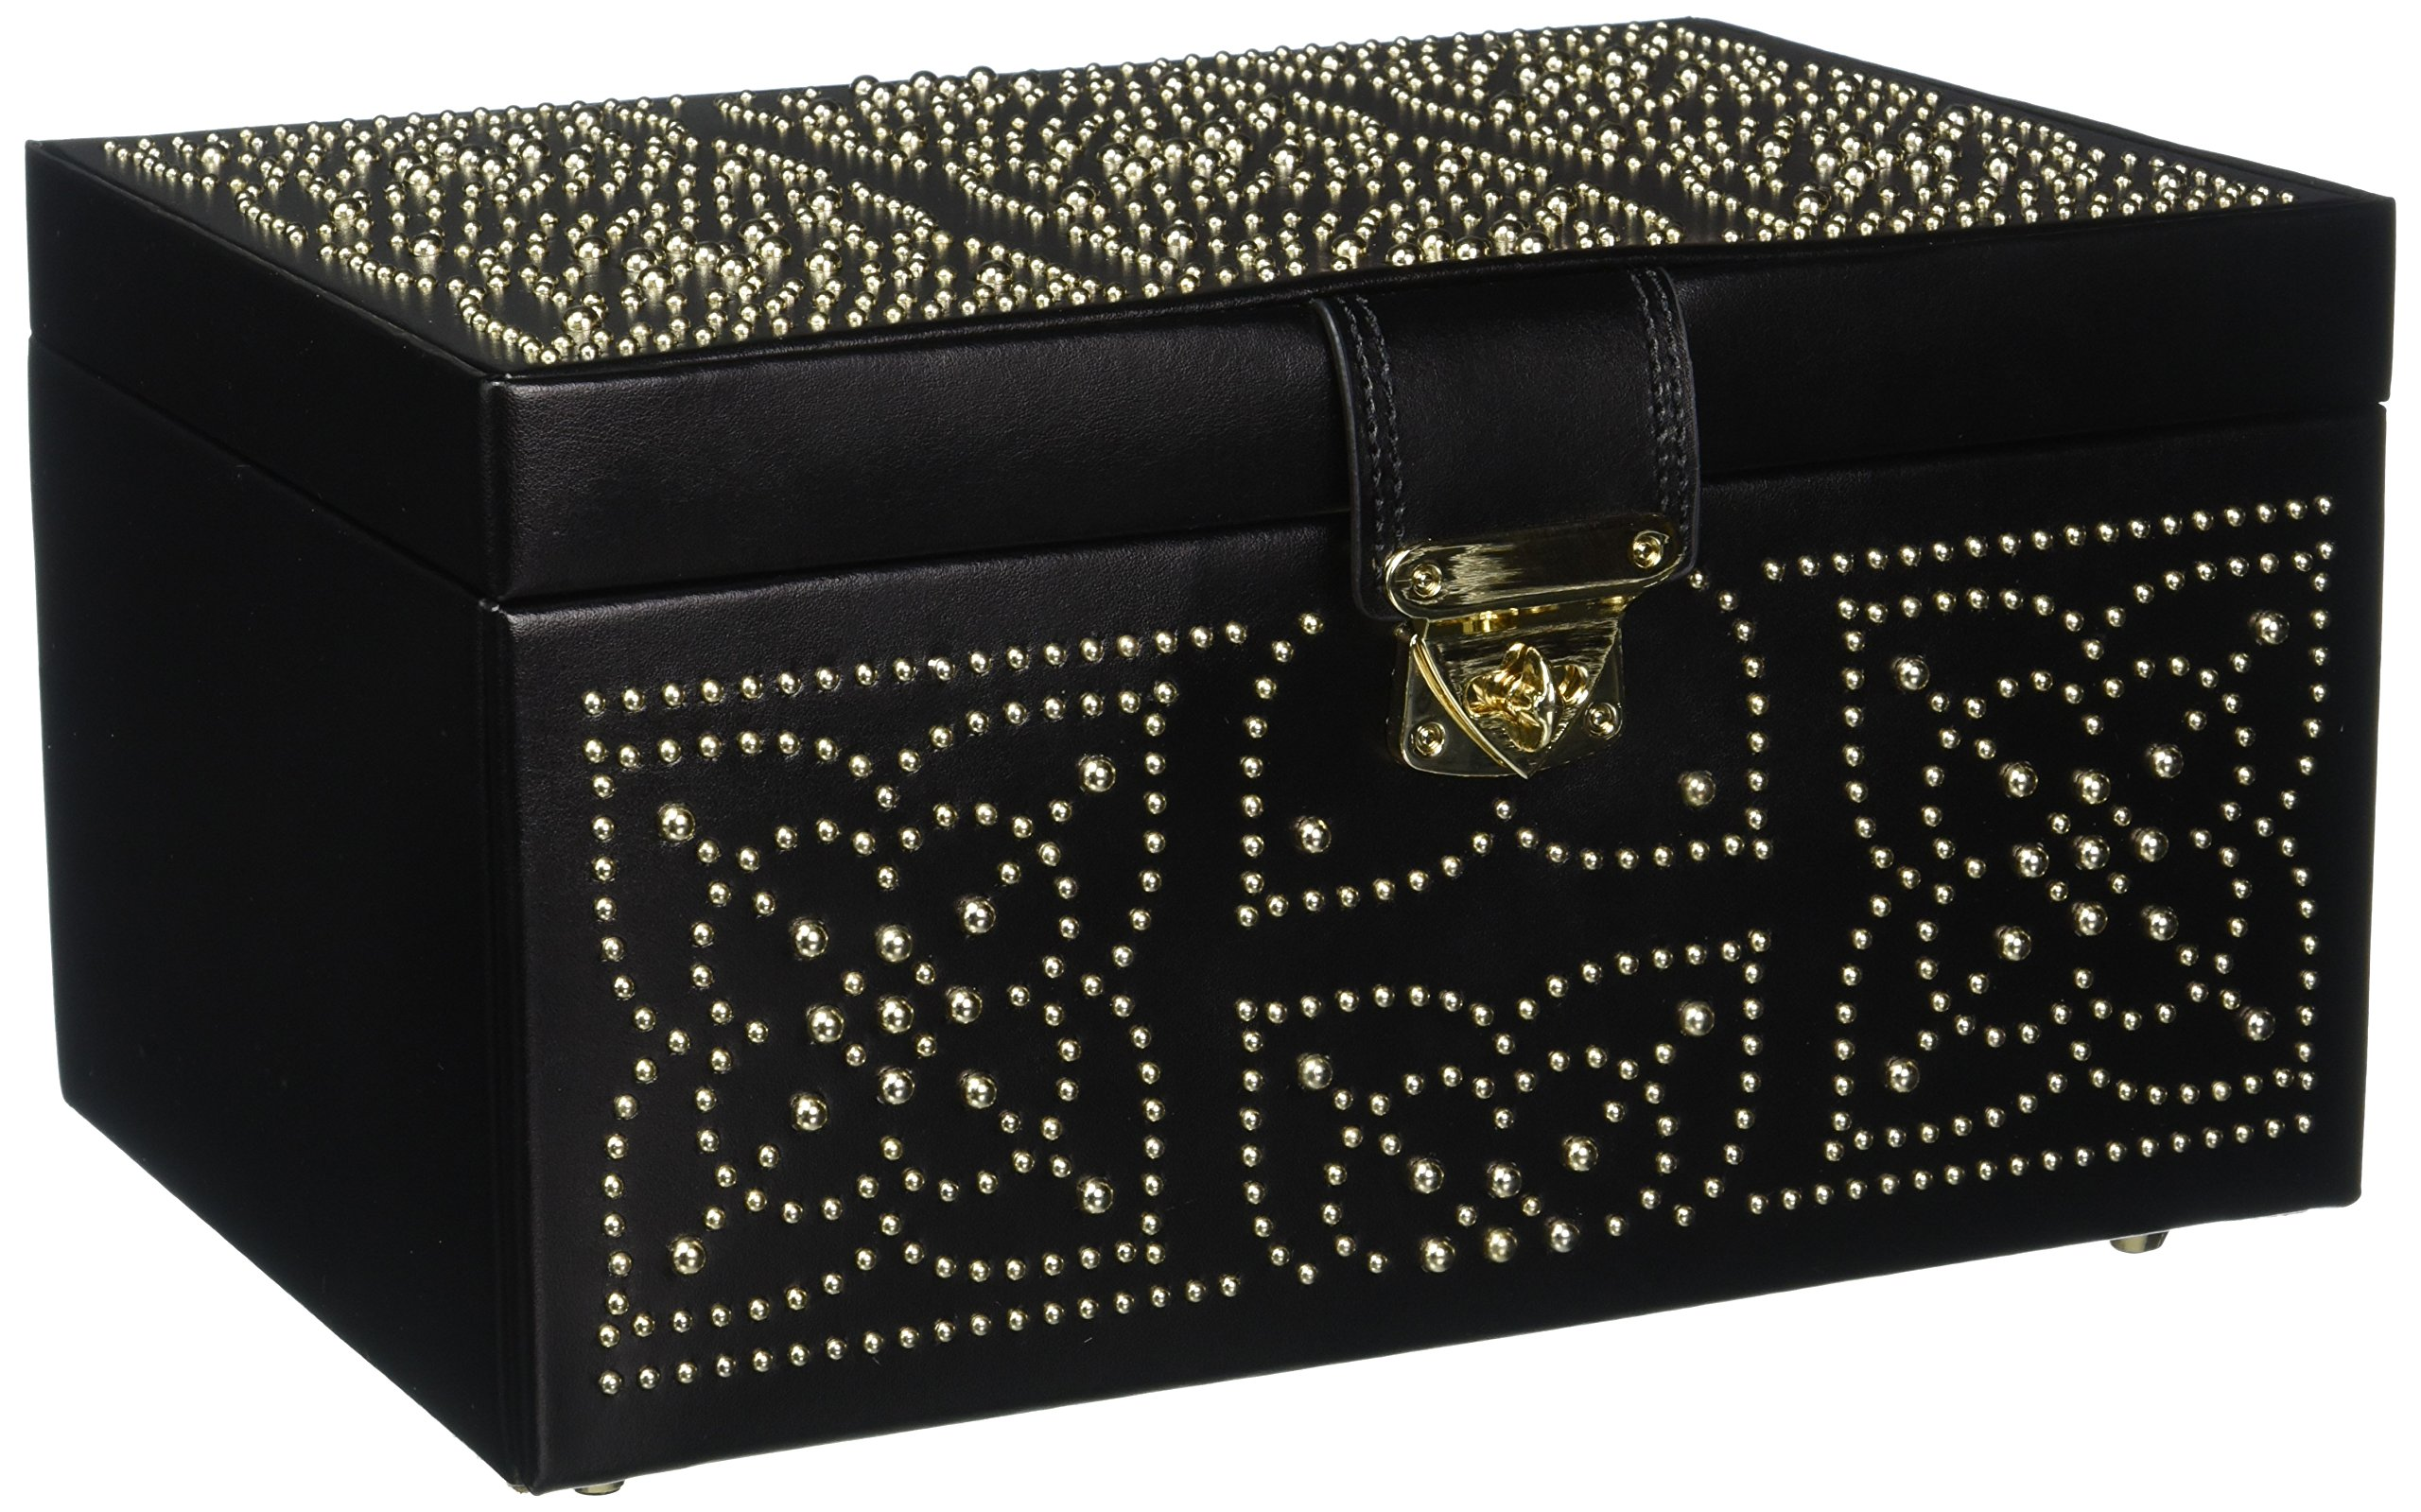 WOLF Marrakesh Medium Jewelry Box Black